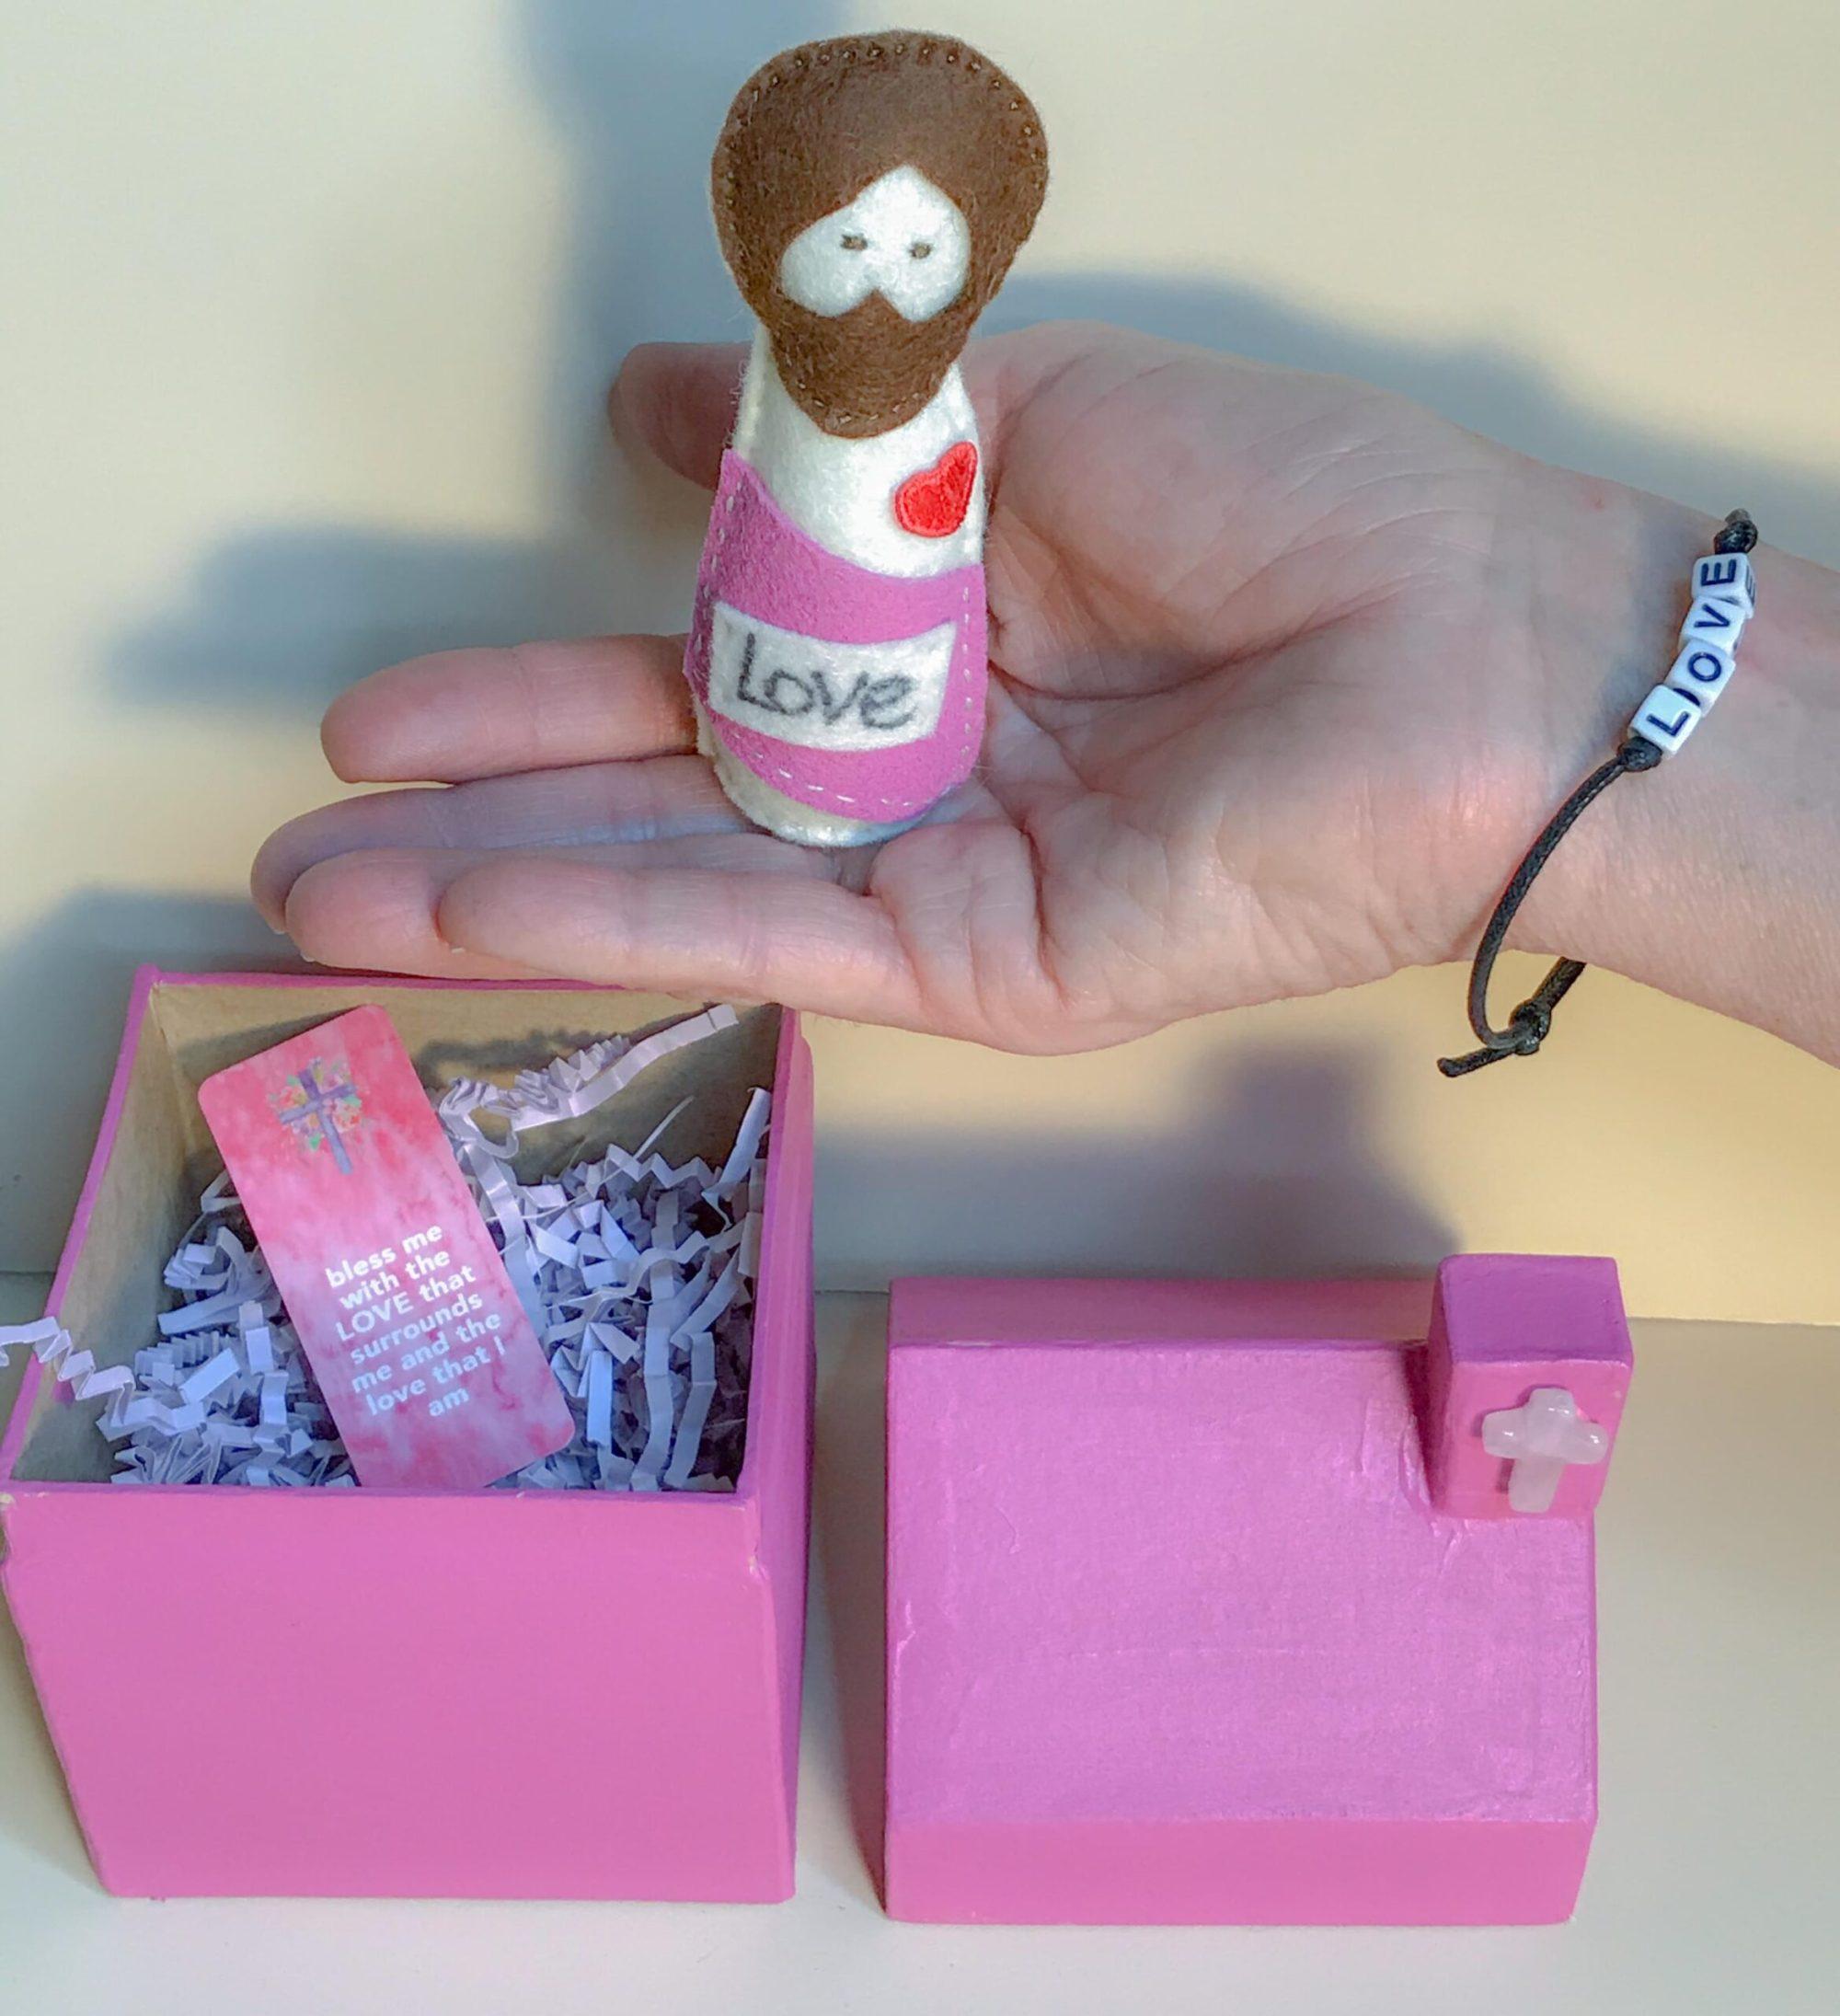 Pocket_jesus_doll_love_03.min